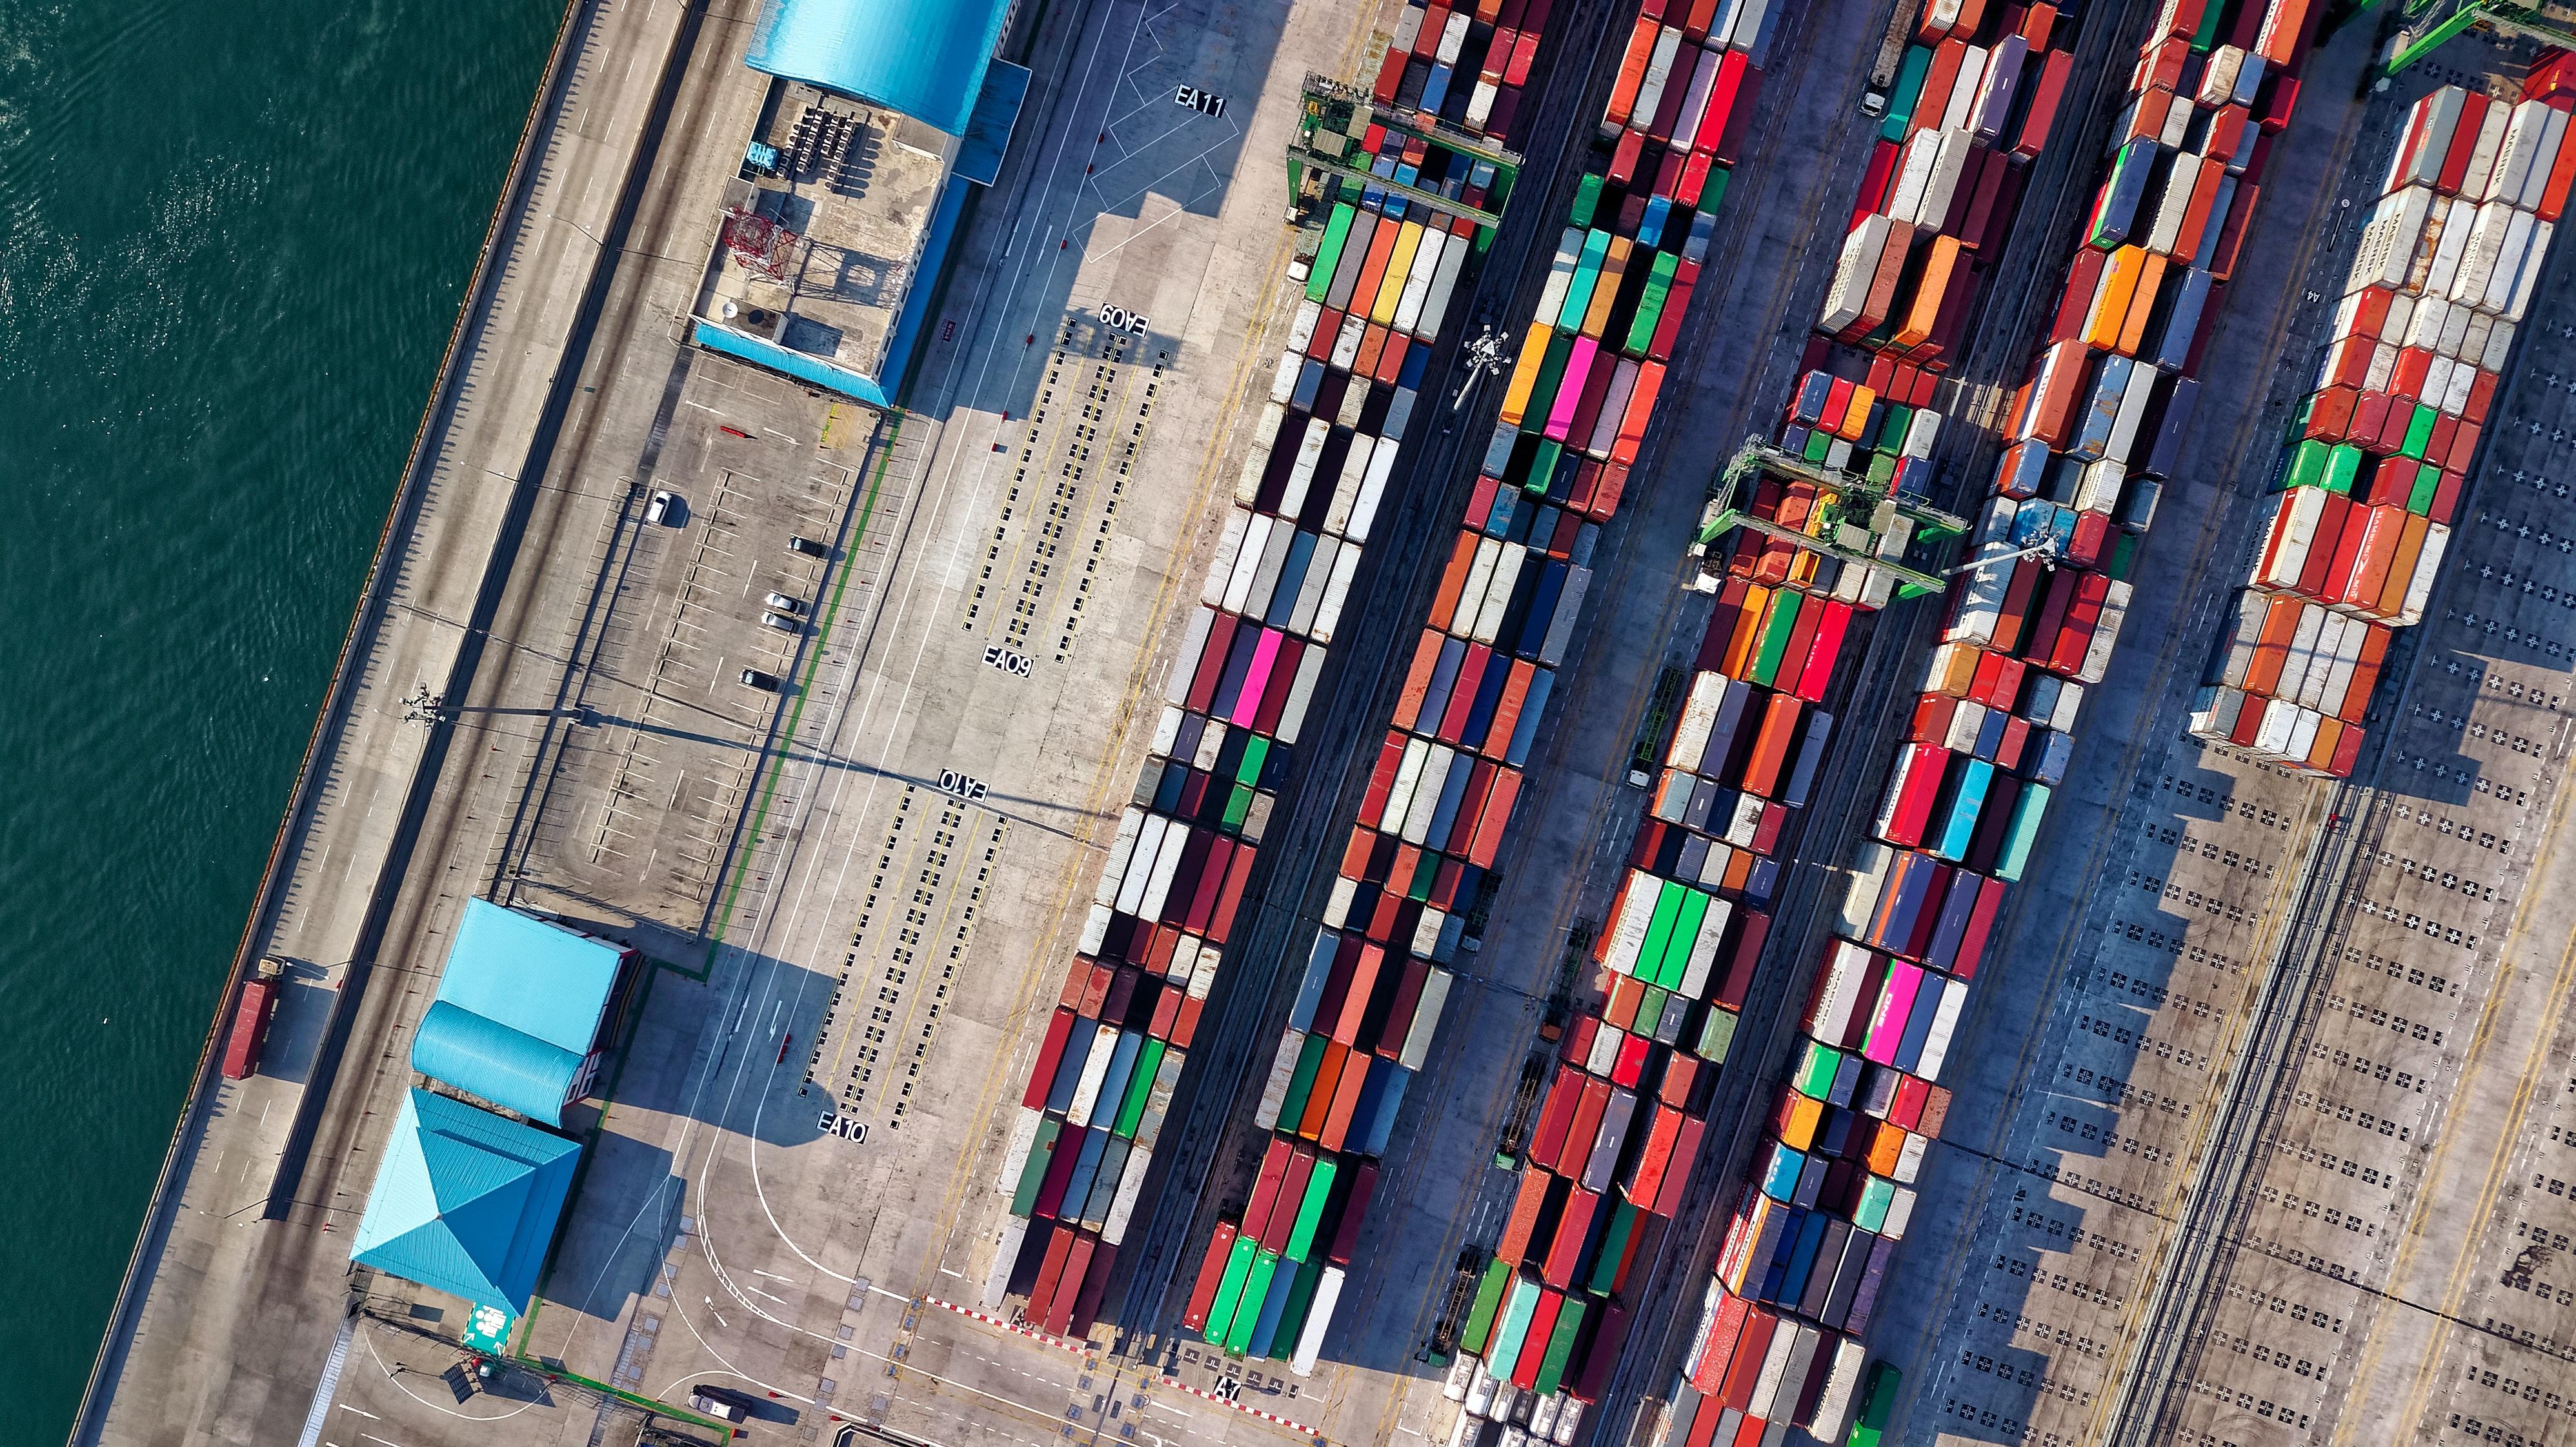 Benefits of Big Data Analytics for Supply Chain Management